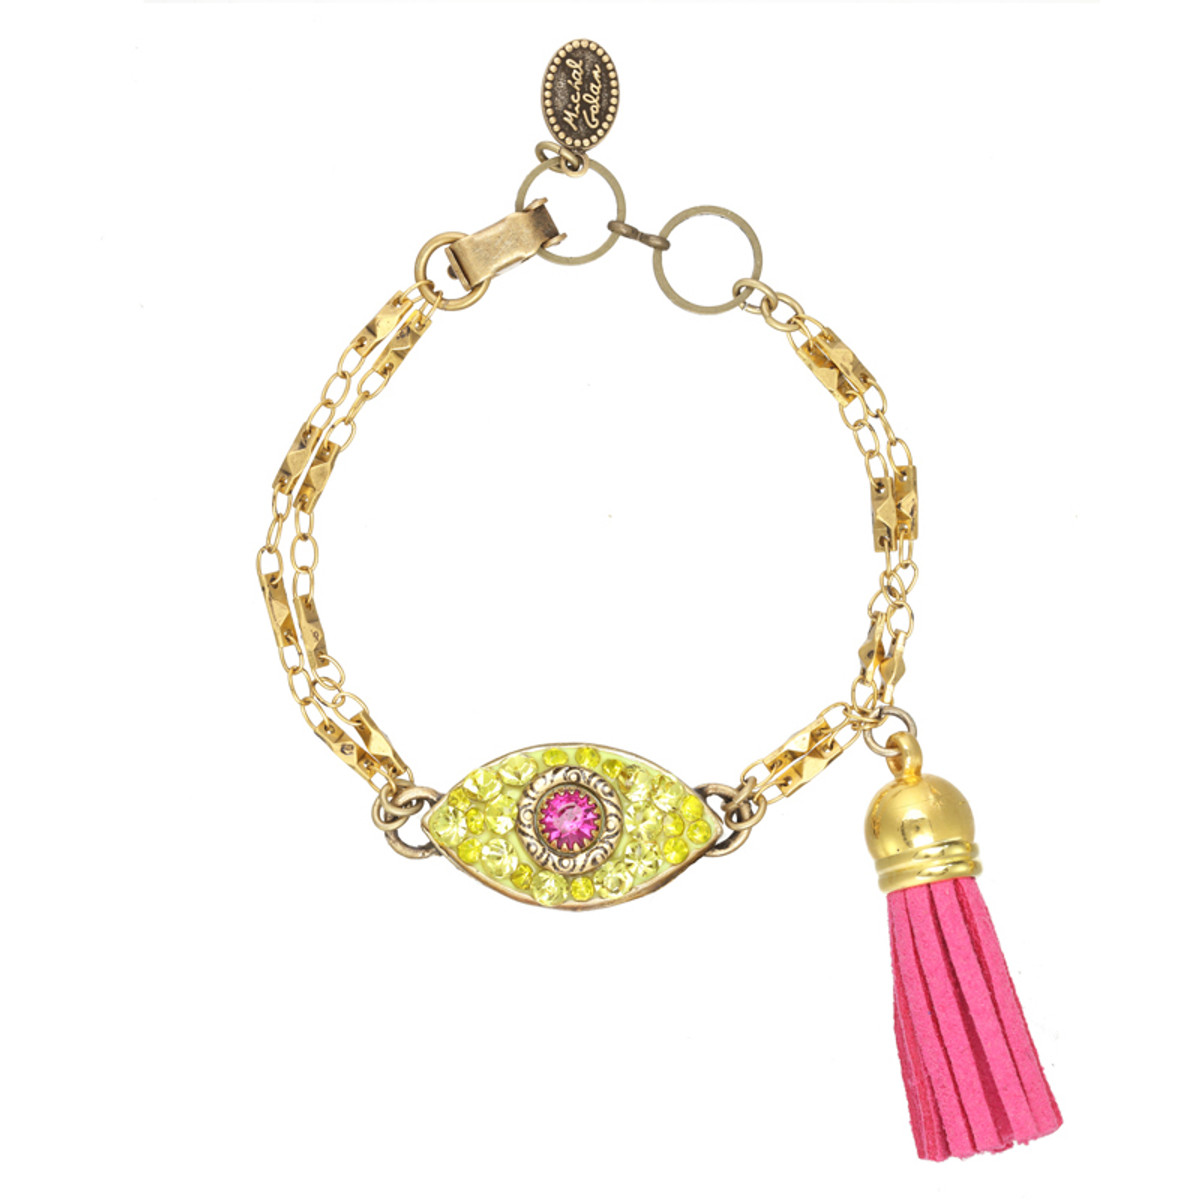 Michal Golan Dazzling Yellow and Pink Eye Charm Bracelet